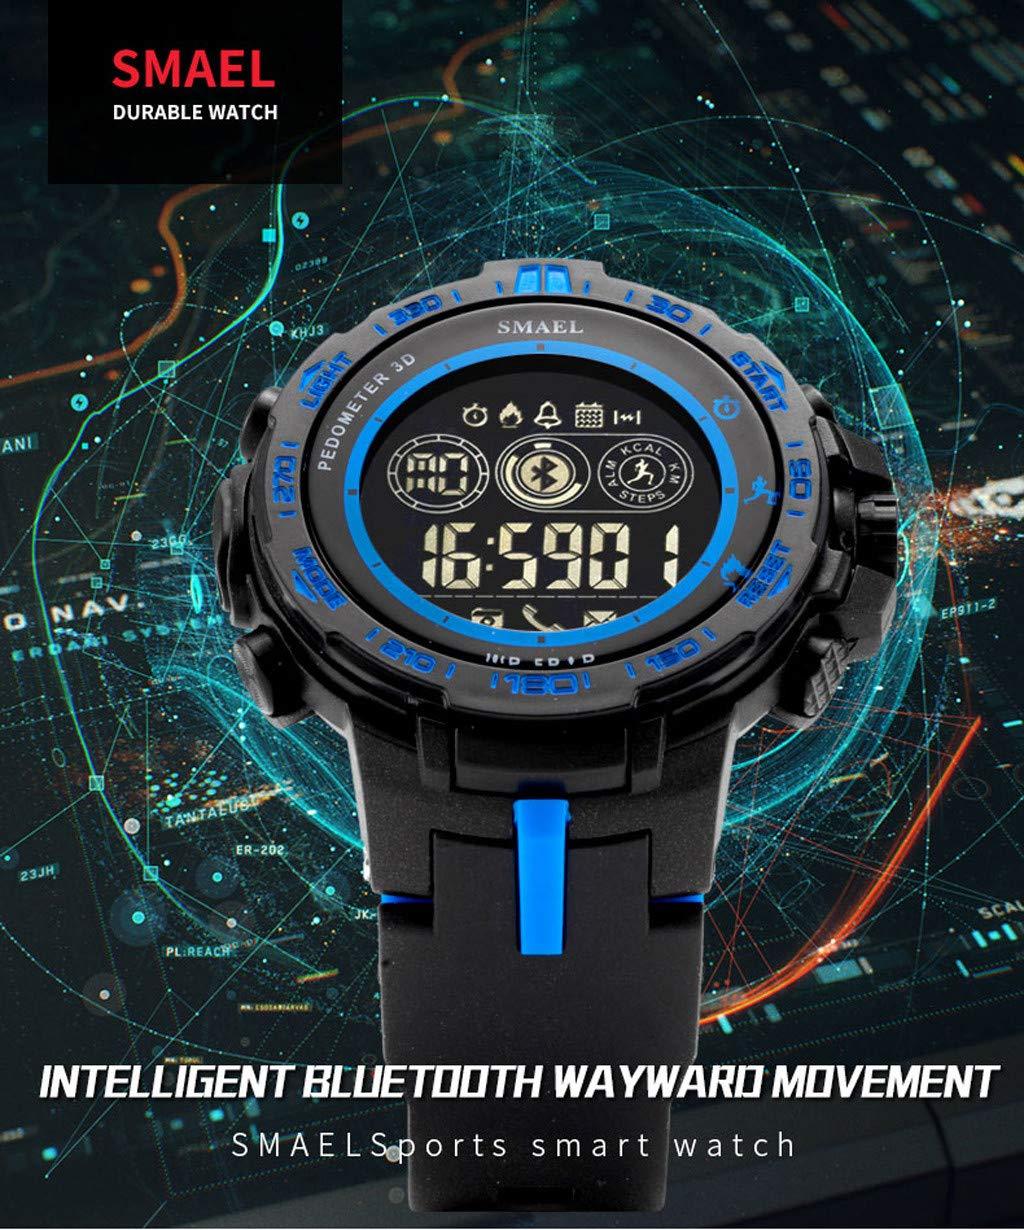 Guartz Watches for Men Digital Under 10 Dollars ❤ SMAEL Bluetooth Smart Sport Men's Watch Style Clock Call Calorie Digital Watches